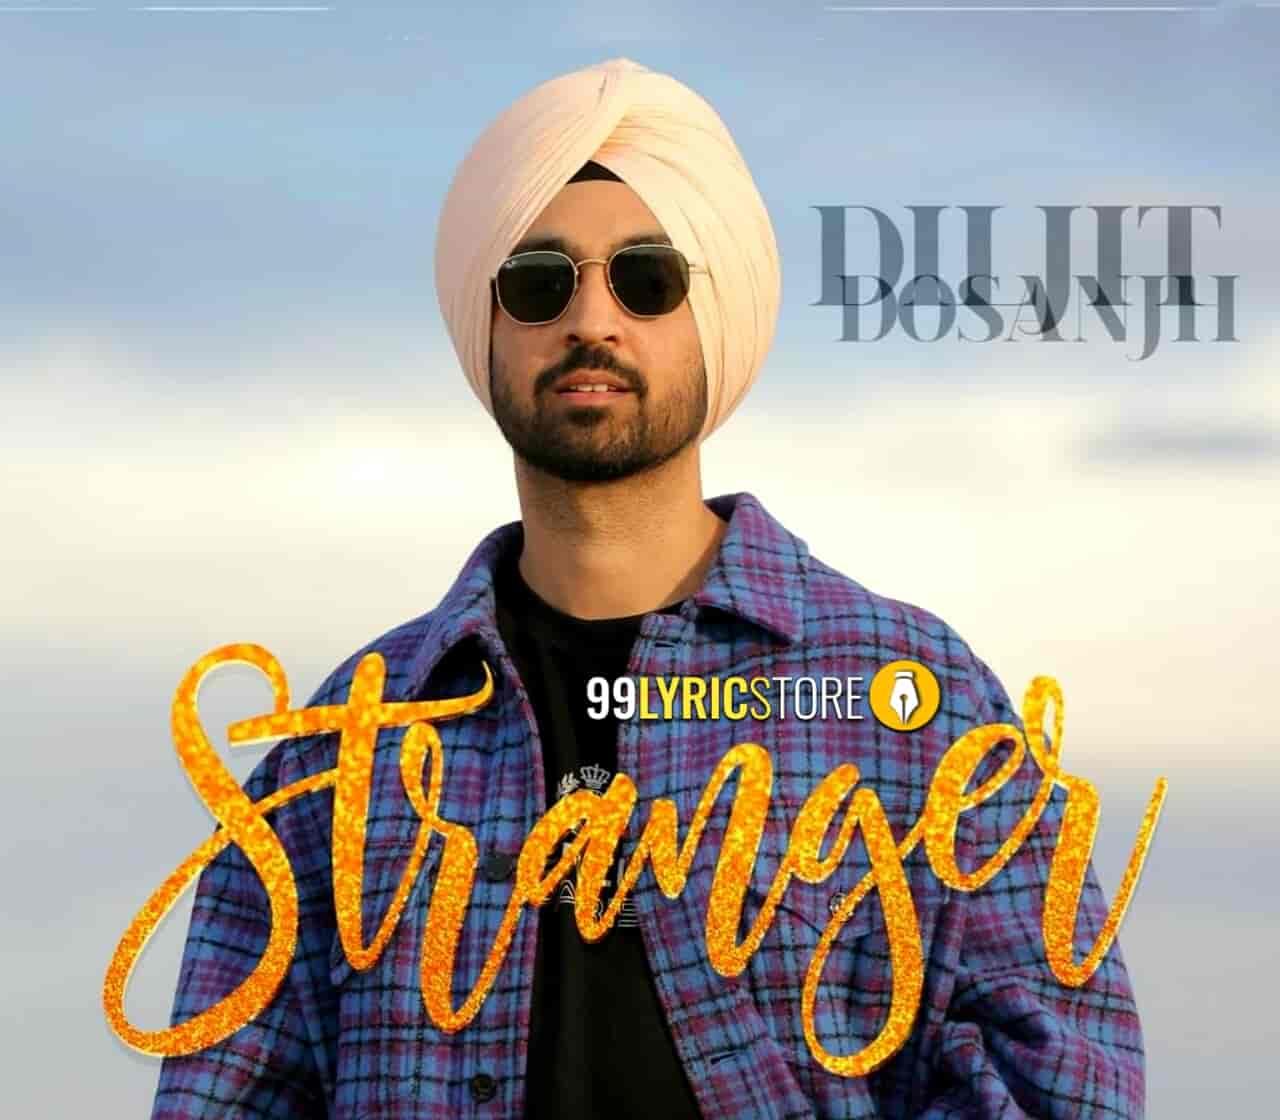 Stranger Punjabi Song Images By Diljit Dosanjh